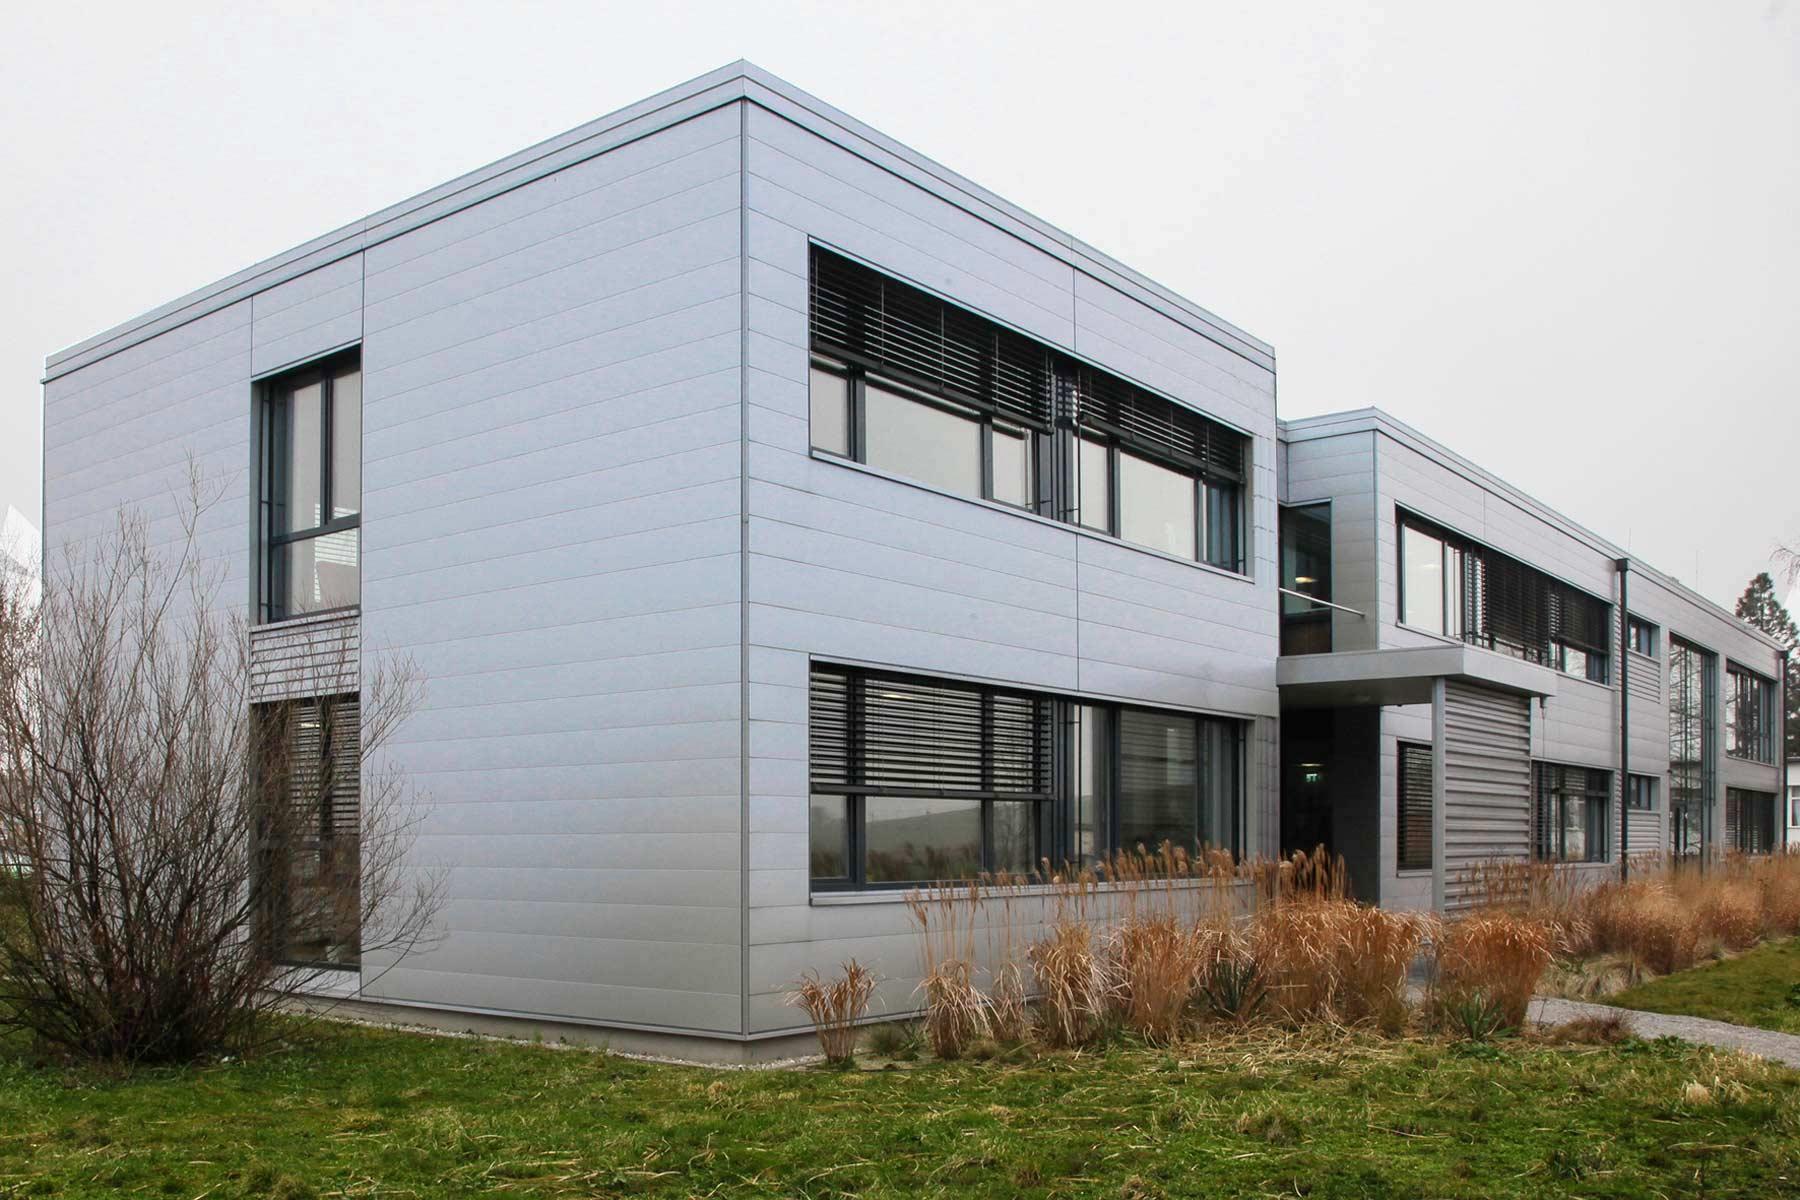 FMW Förderanlagen GmbH